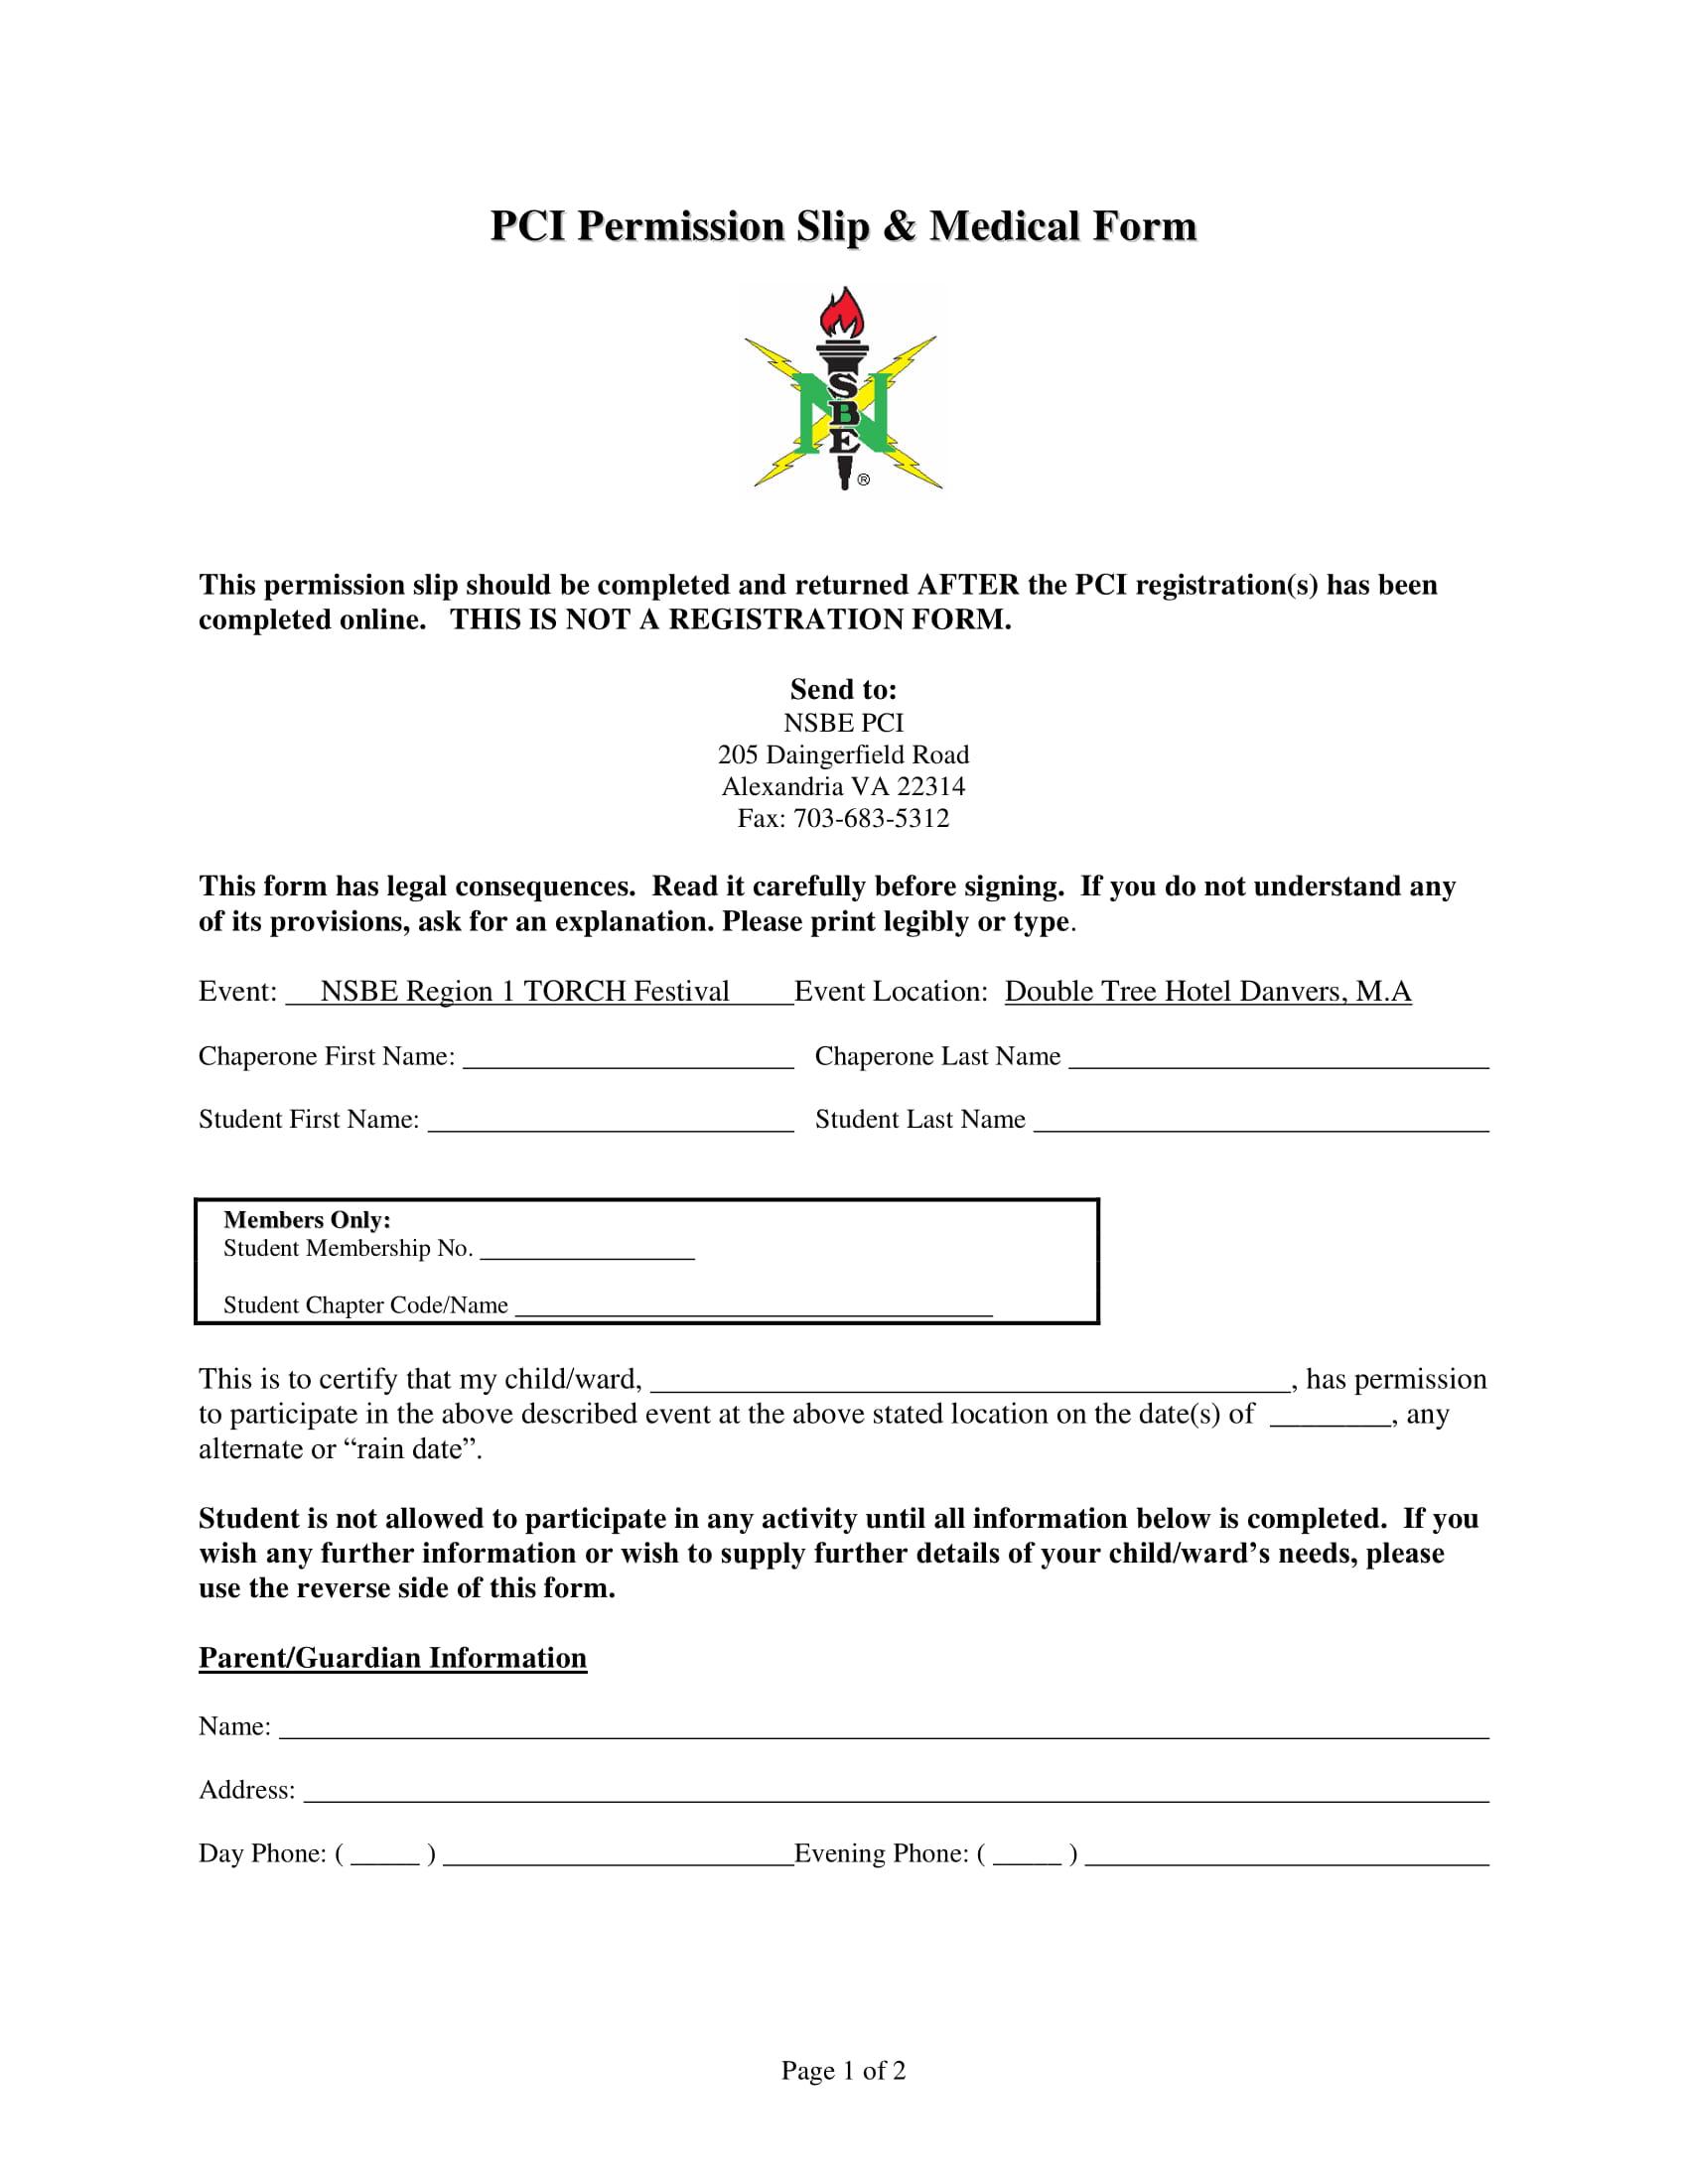 PCI Permissions Form Page 1